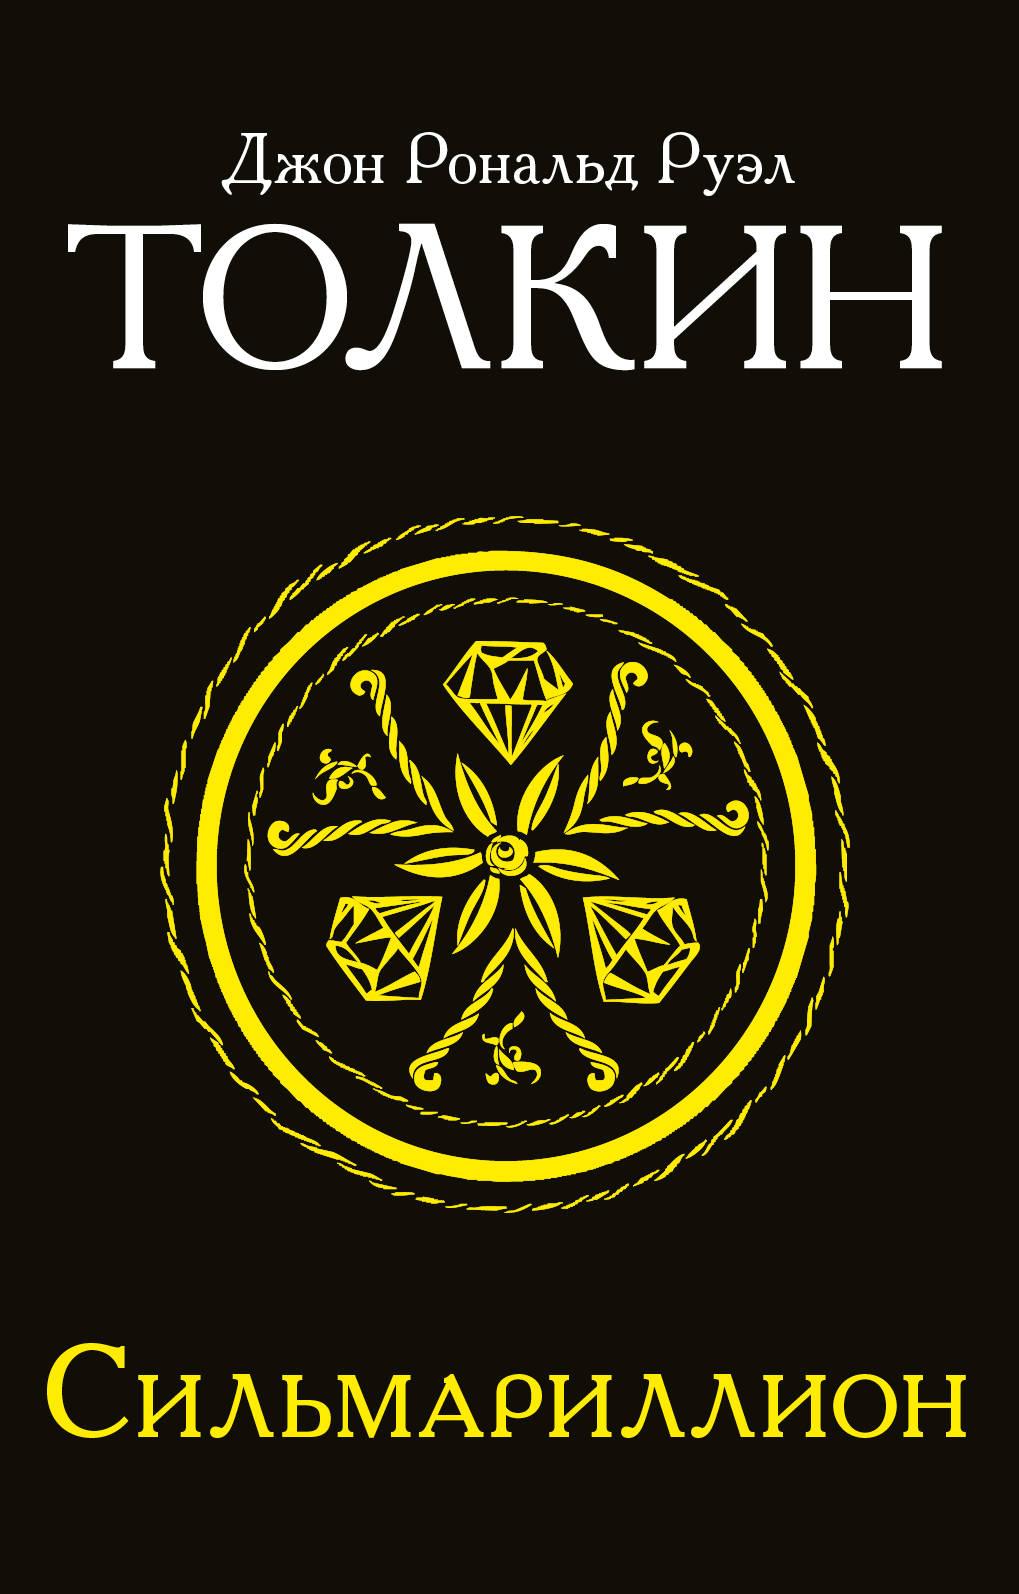 Толкин Д.Р.Р Сильмариллион ISBN: 978-5-17-095695-1 джон рональд руэл толкин толкиен the silmarillion tolkien j сильмариллион